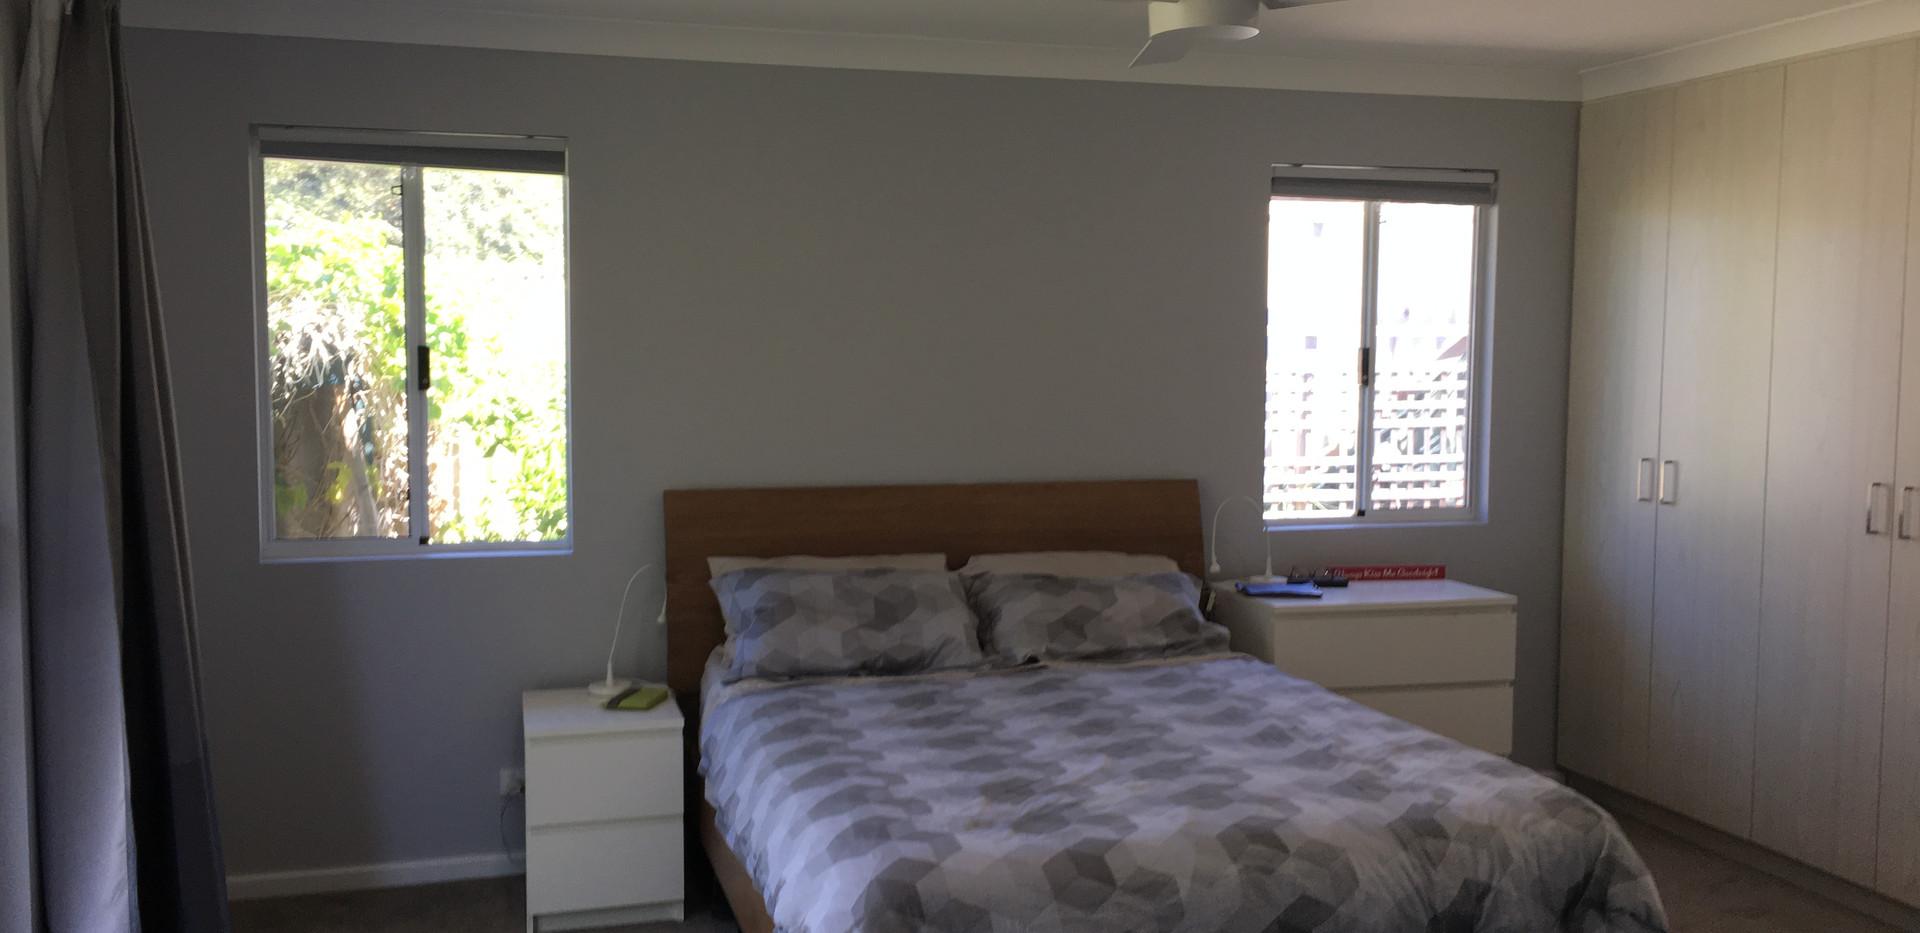 master bedroom extension Craigie